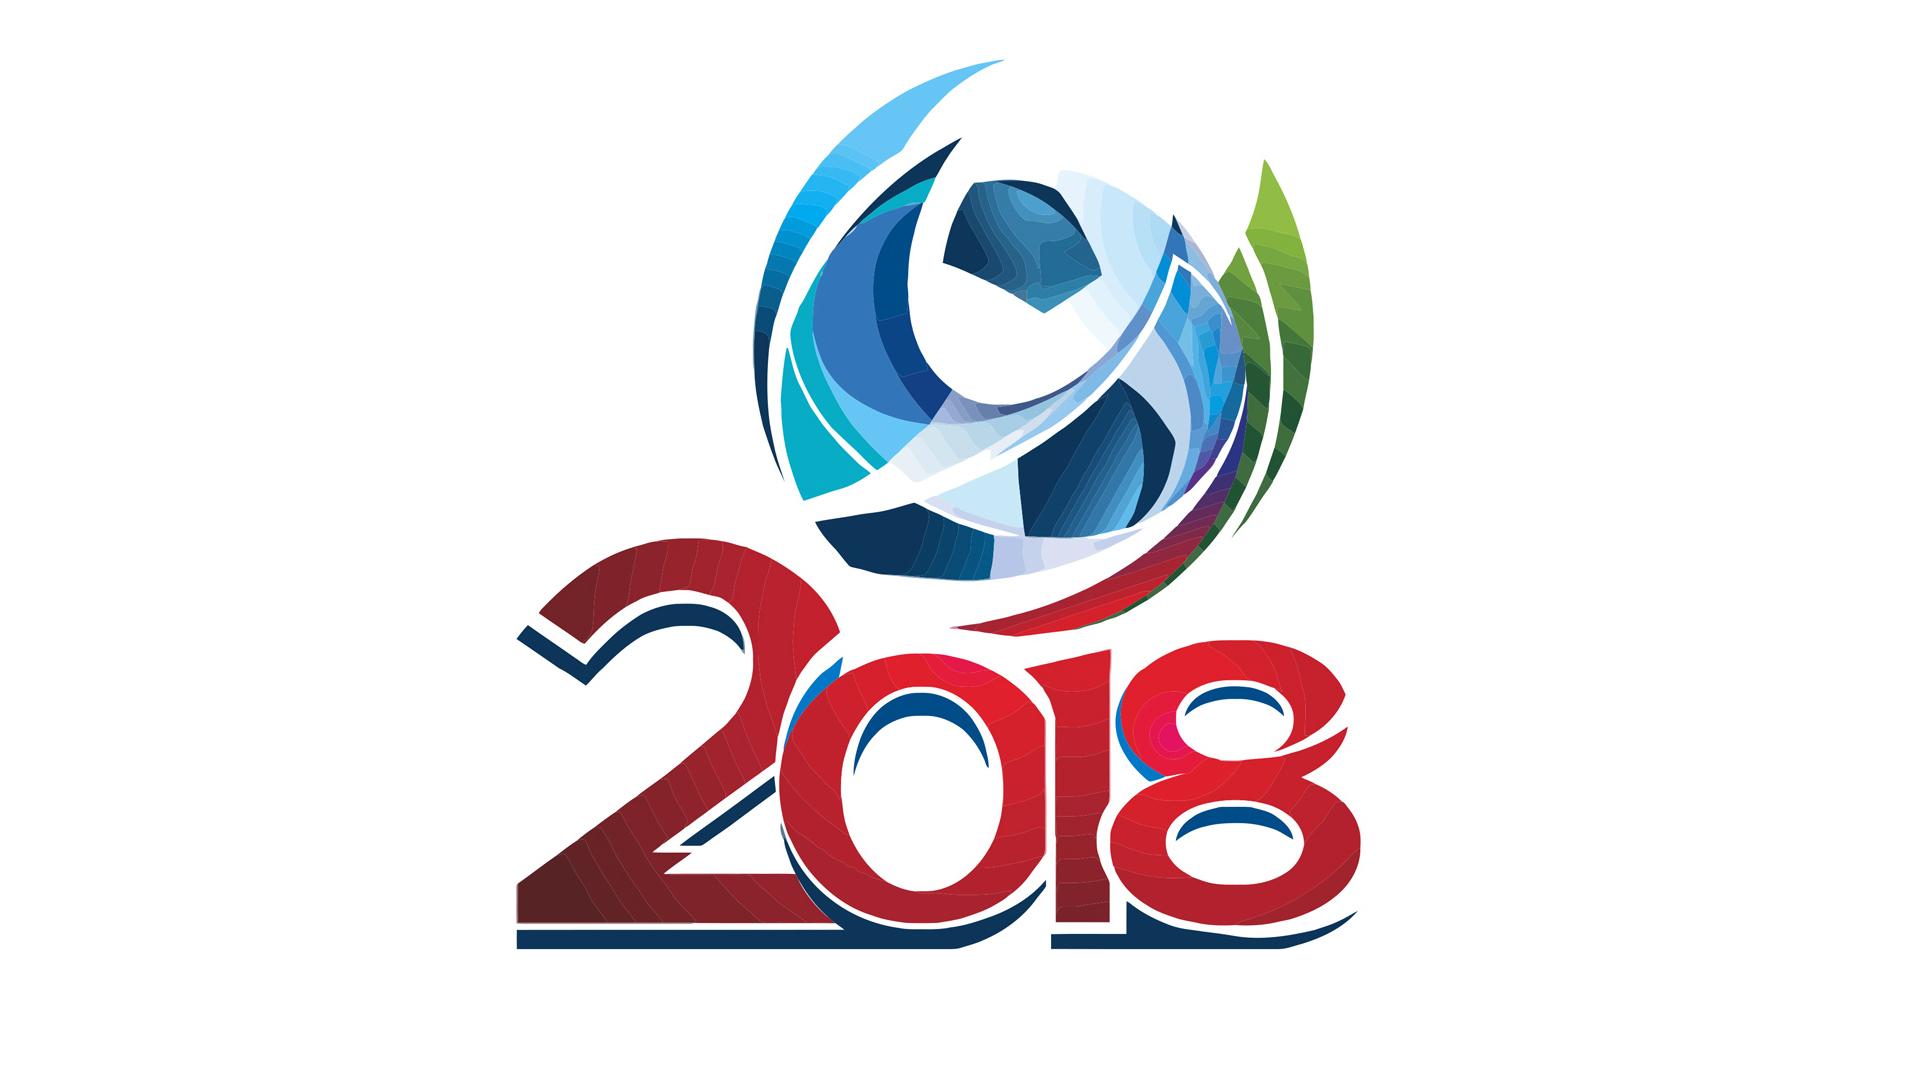 Чемпионат мира по футболу 2018 | города, регламент